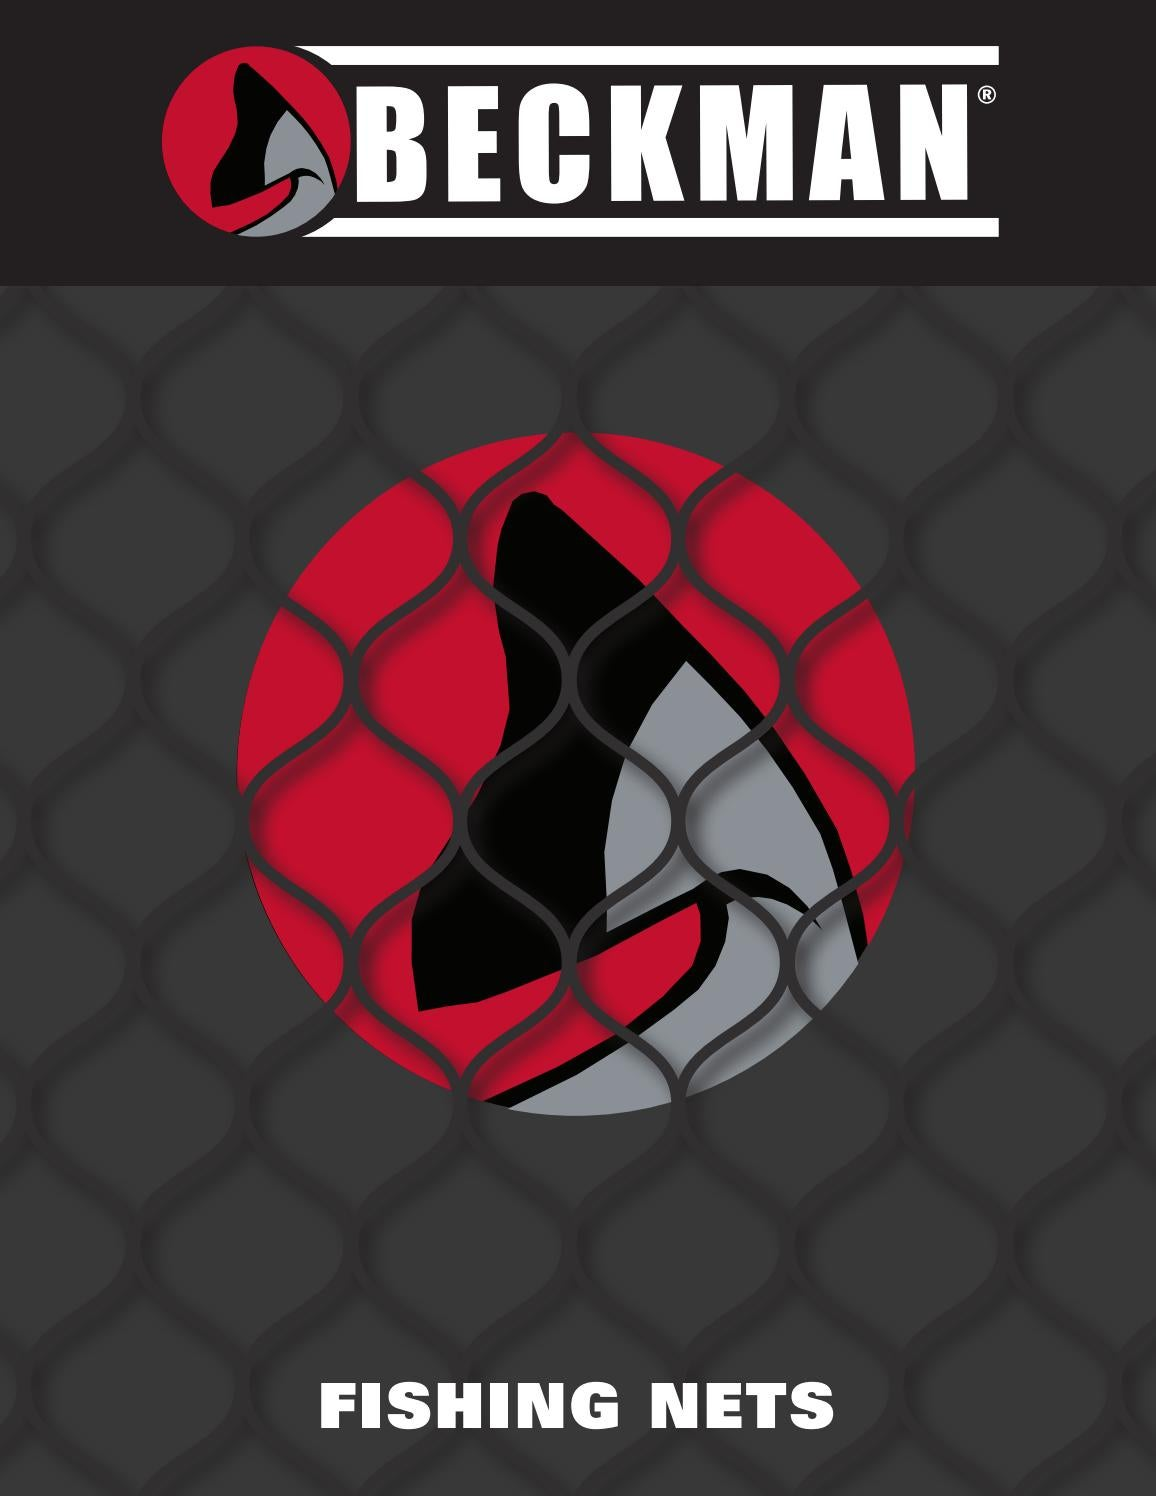 Beckman Nets Catalog By P Line Issuu